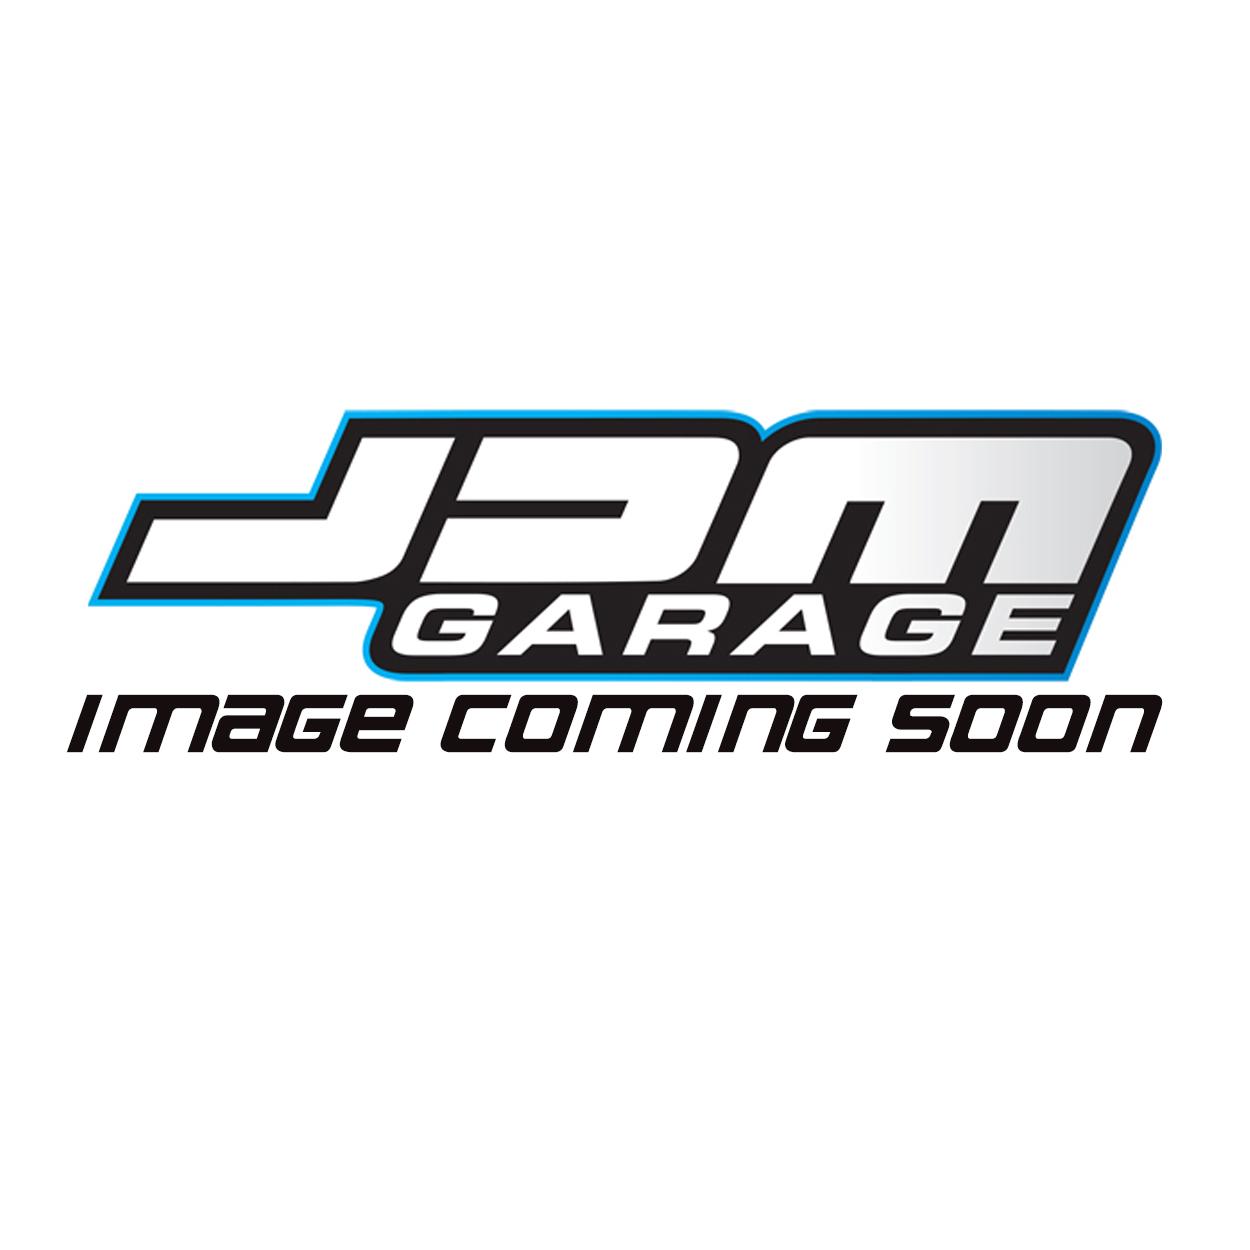 OE Replacement & EBC GD Series Rear Brake Discs - Mazda MX5 Mk2 NB 98-05